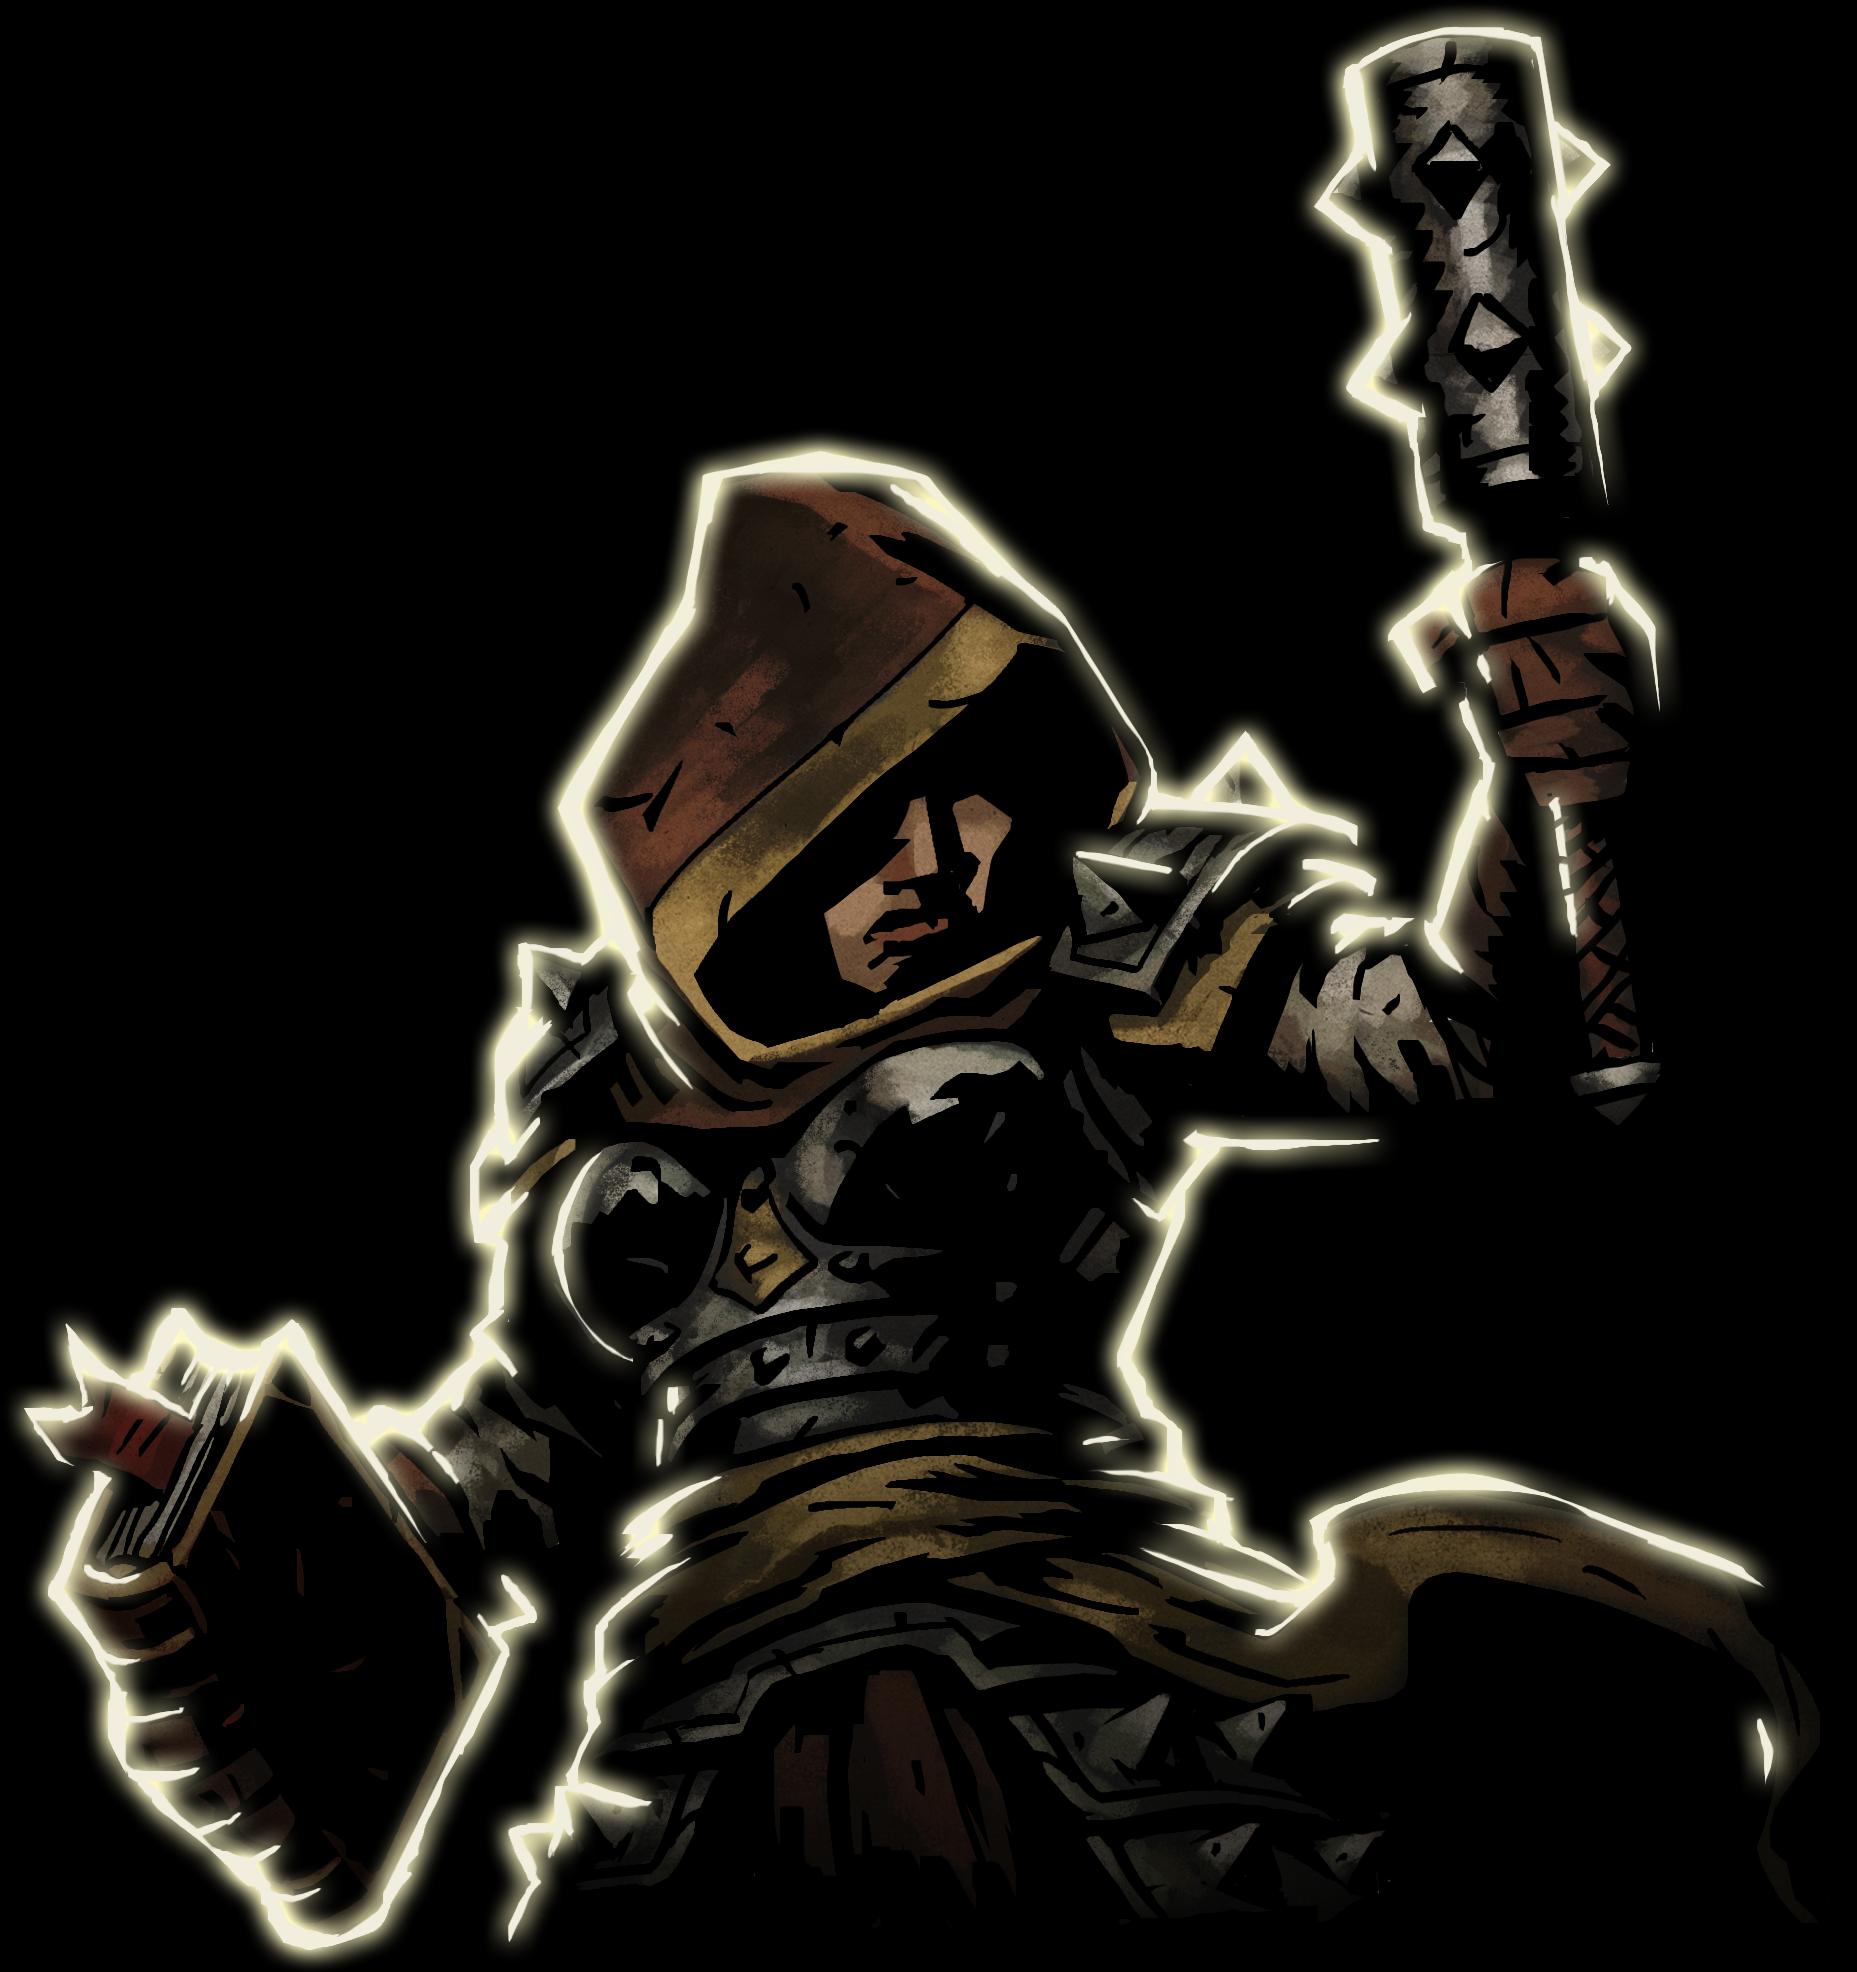 Darkest Dungeon Heroics Rpg Personagens De Rpg Inspiracao Para Personagens